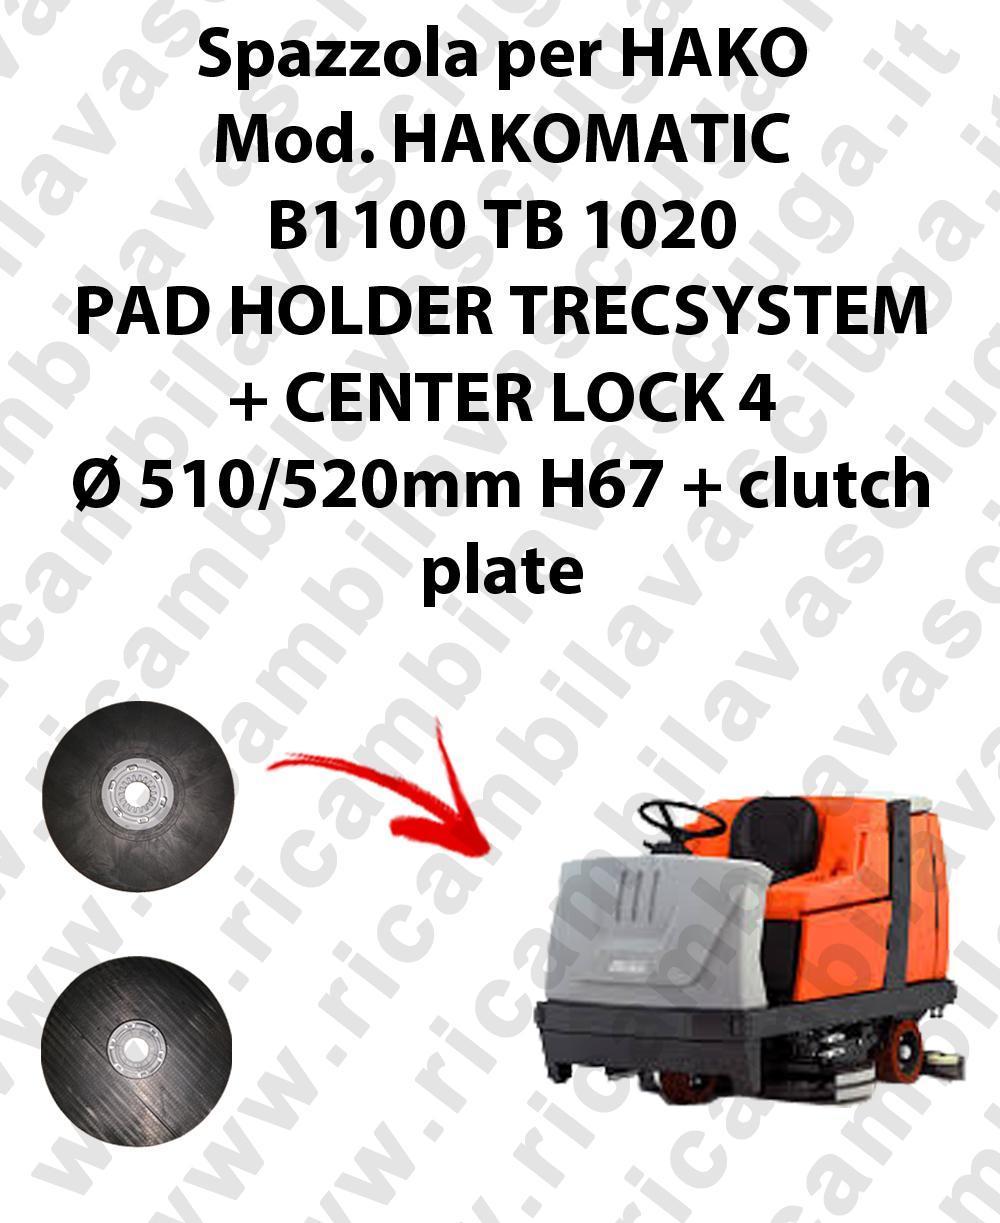 PAD HOLDER TRECSYSTEM  para fregadora HAKO modelo HAKOMATIC B1100 TB 1020